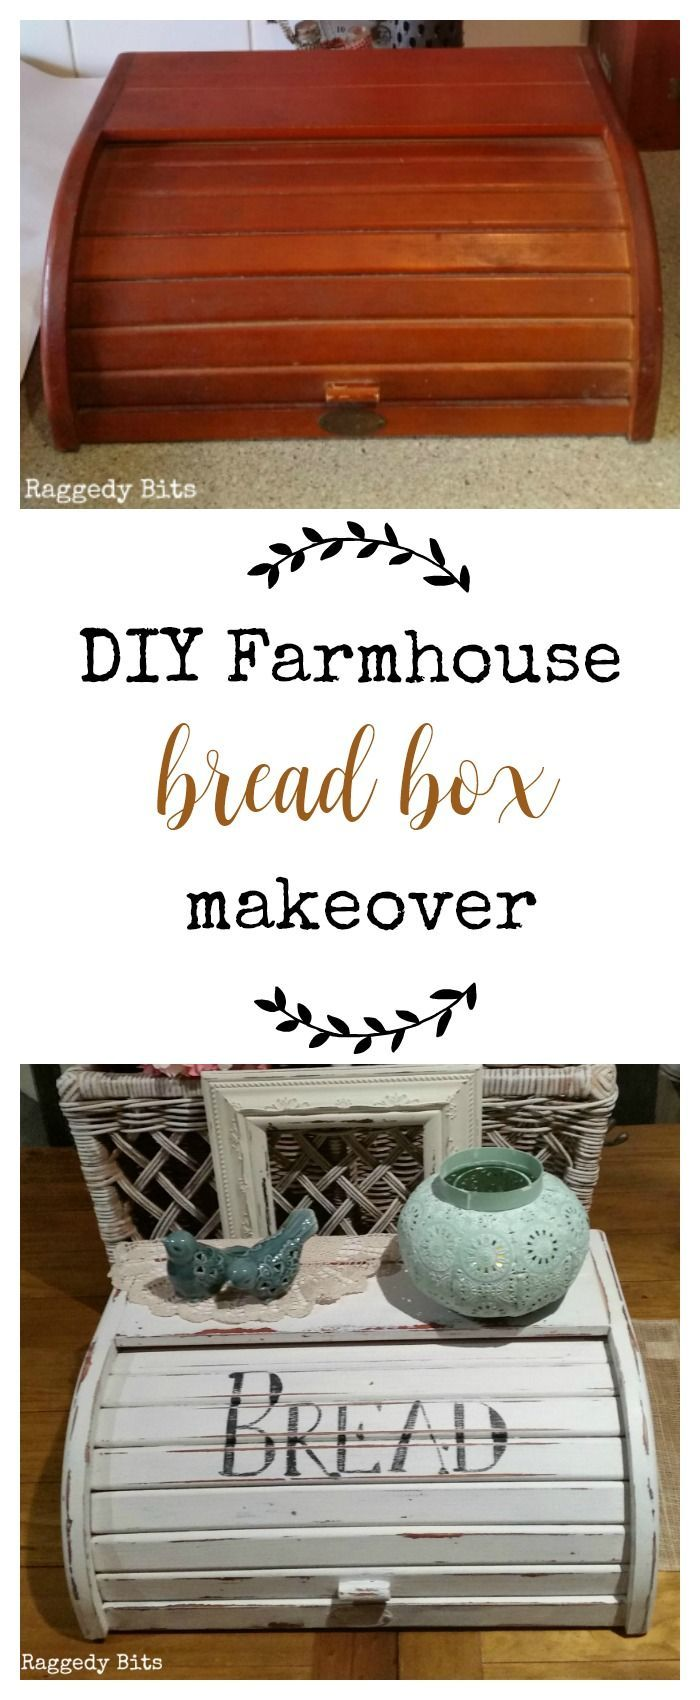 DIY Farmhouse Bread Box Makeover Farmhouse bread boxes